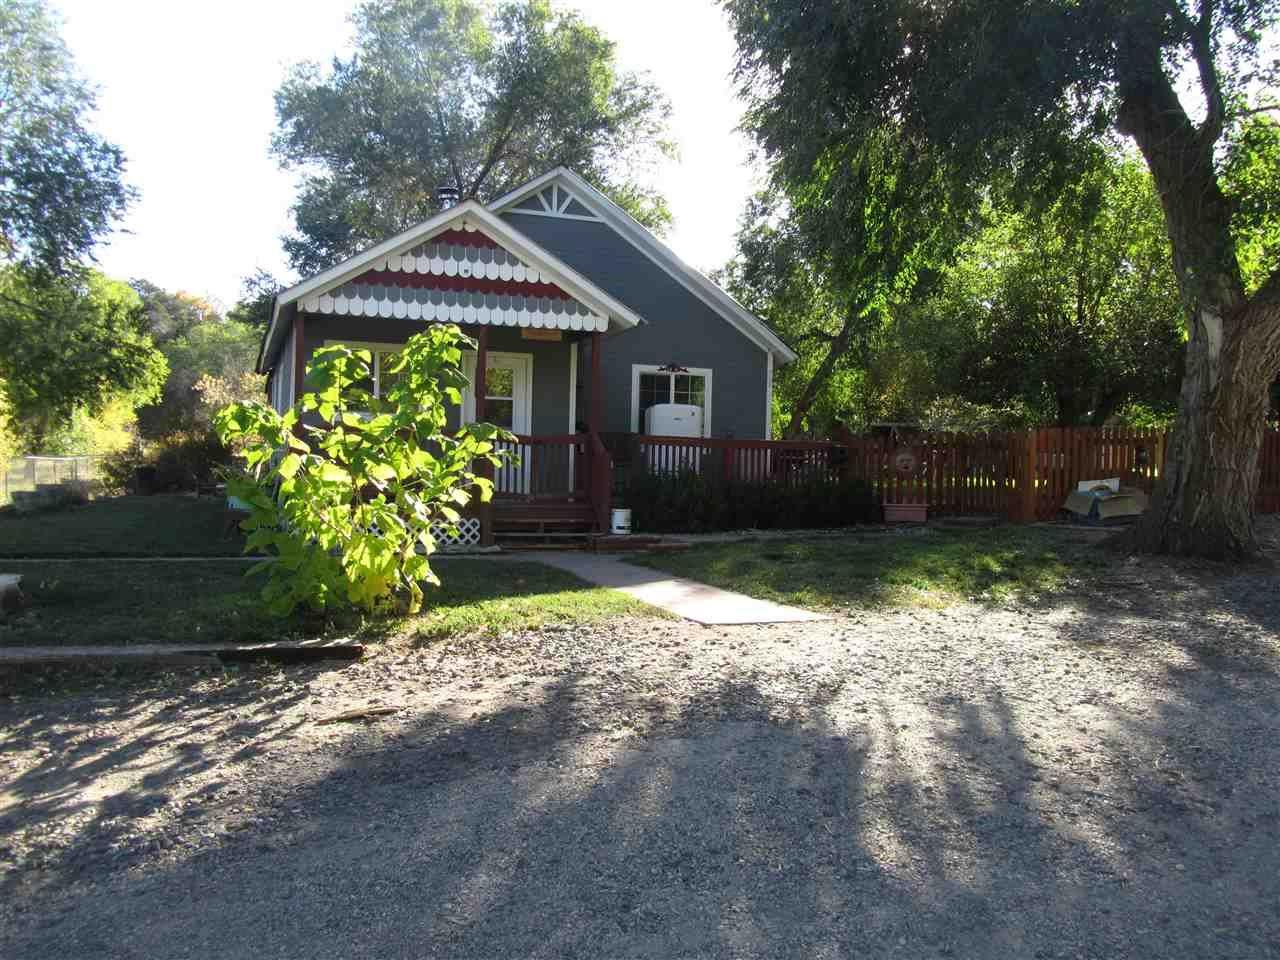 Photo of 15650 Pearl Avenue, Collbran, CO 81624 (MLS # 20205171)